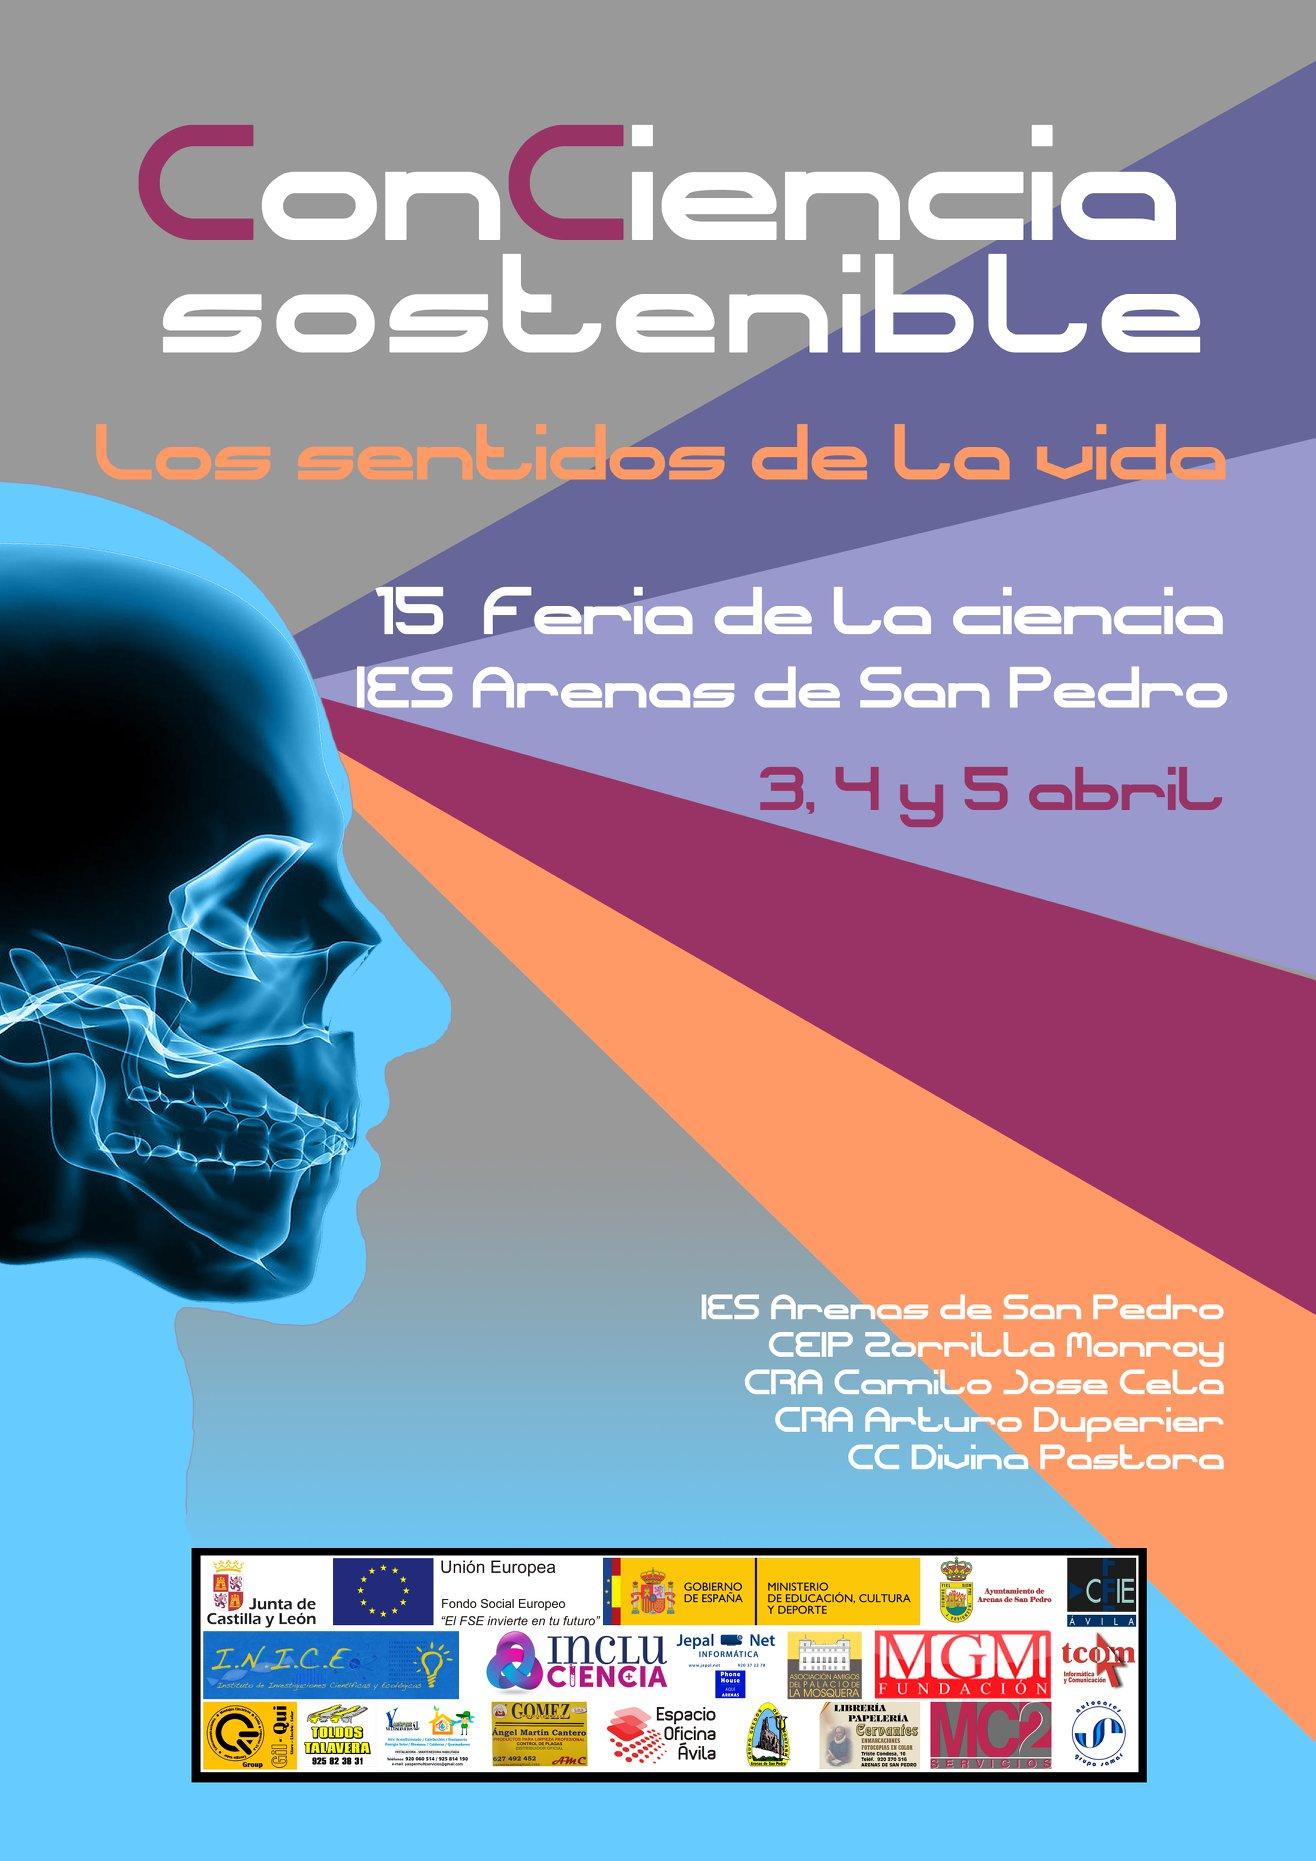 XV Feria de la Ciencia en la Calle - Arenas de San Pedro - TiétarTeVe